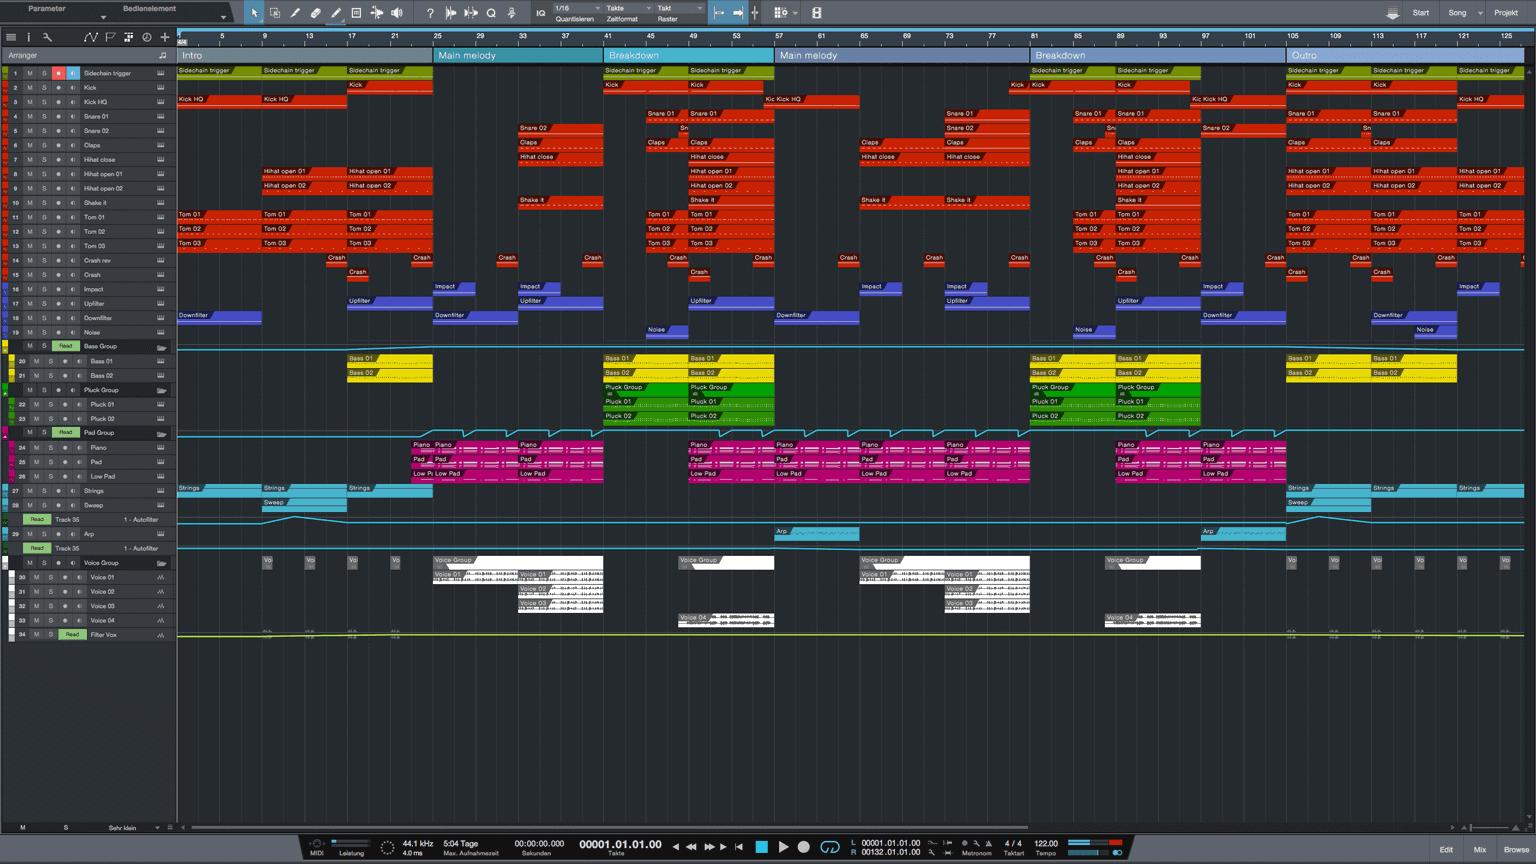 Long-Night-Studio-One-DAW-Template1